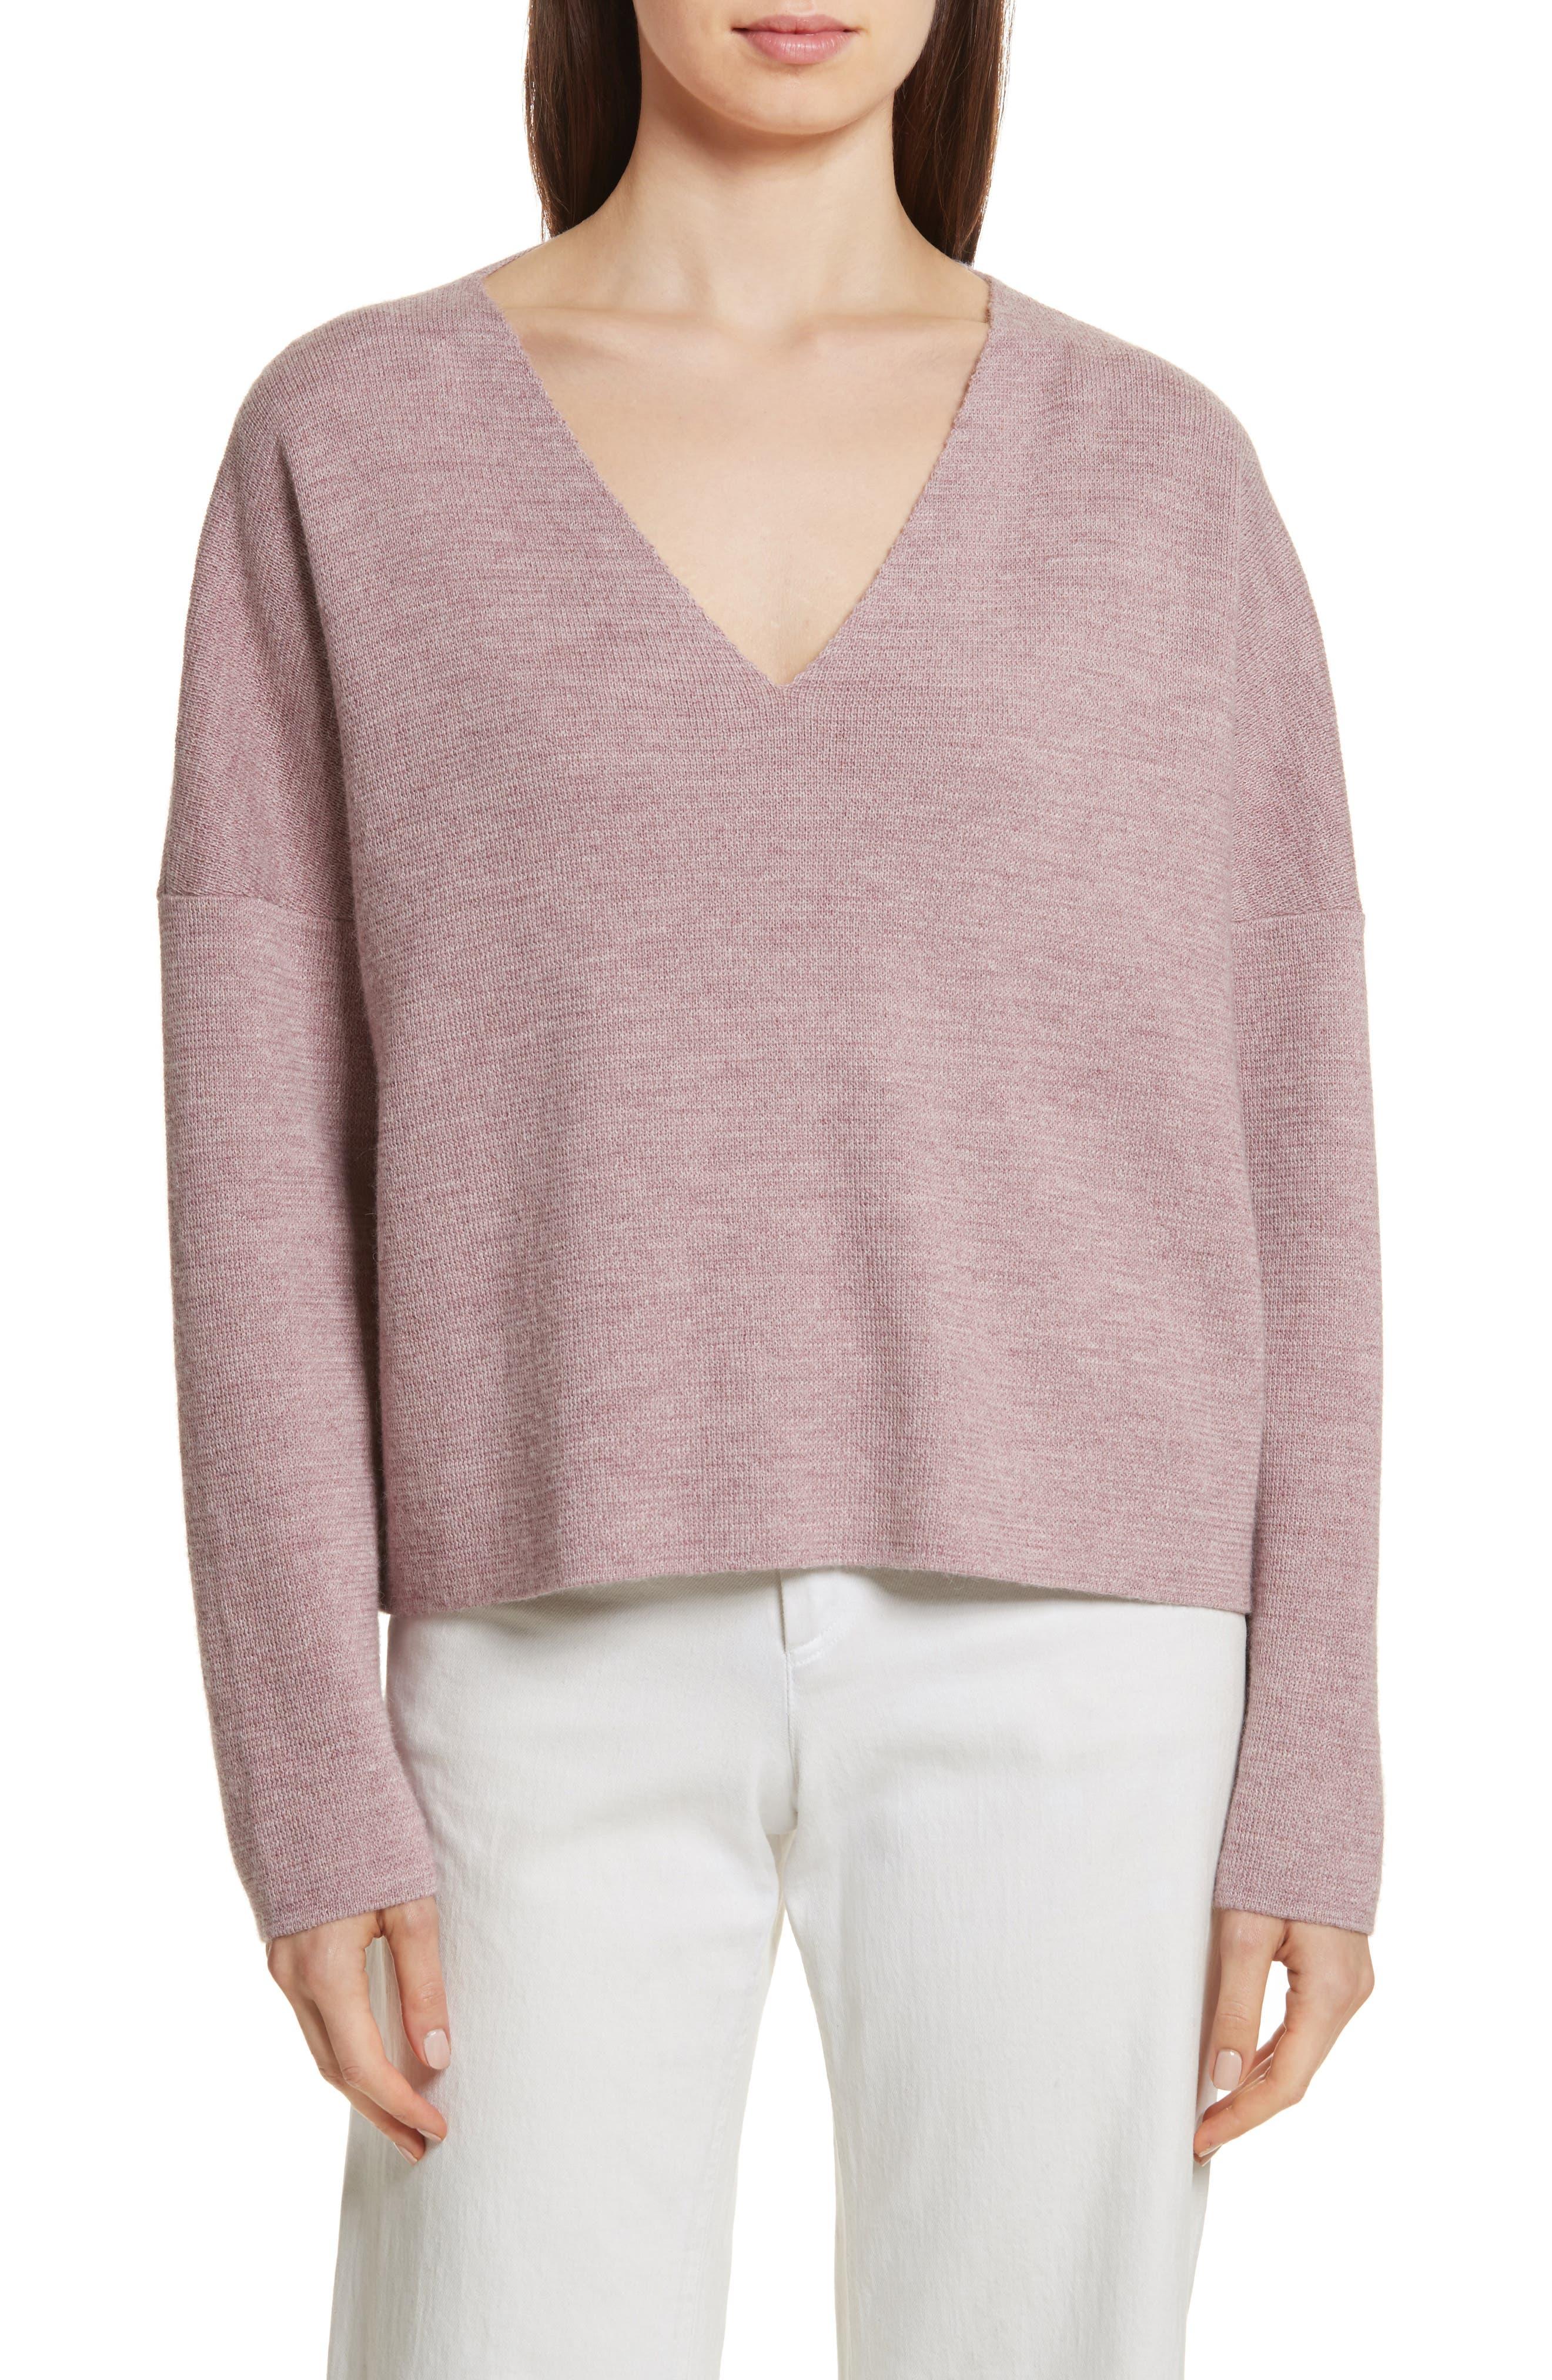 Fount Alpaca Hair Sweater,                         Main,                         color, Lilac